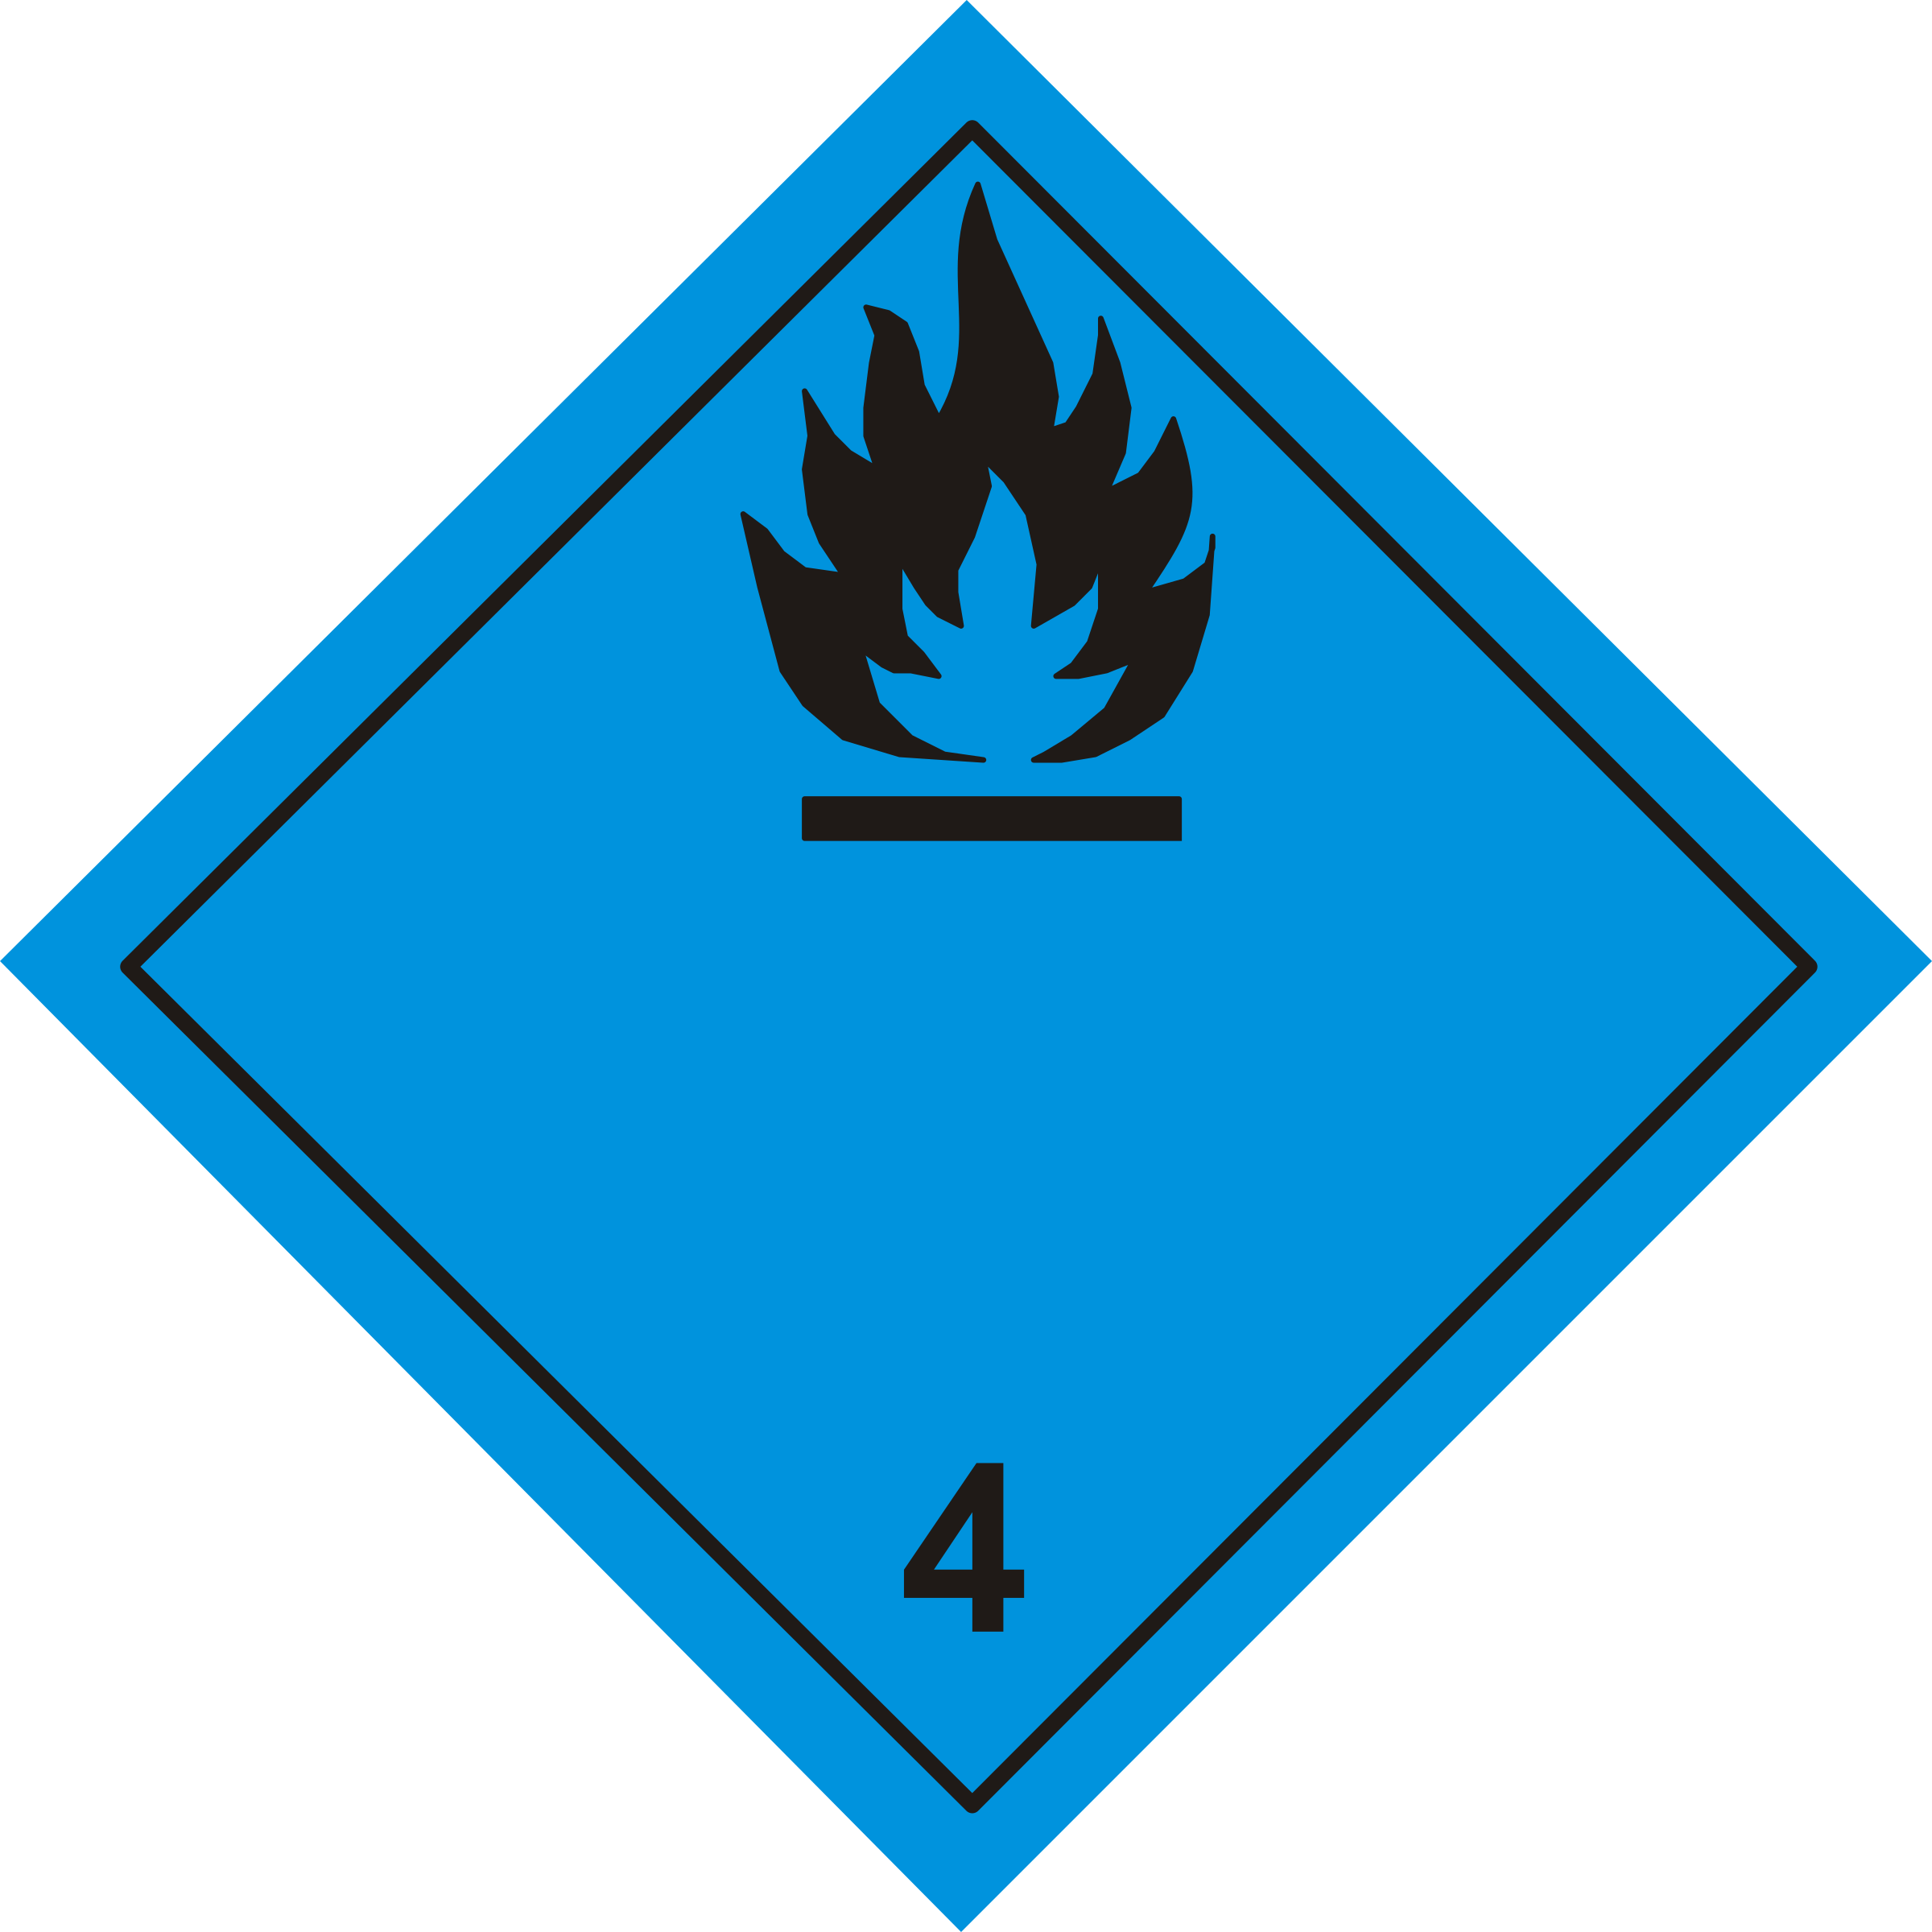 Danger clipart pictogram Pictogram 4 4 Dangerous wet